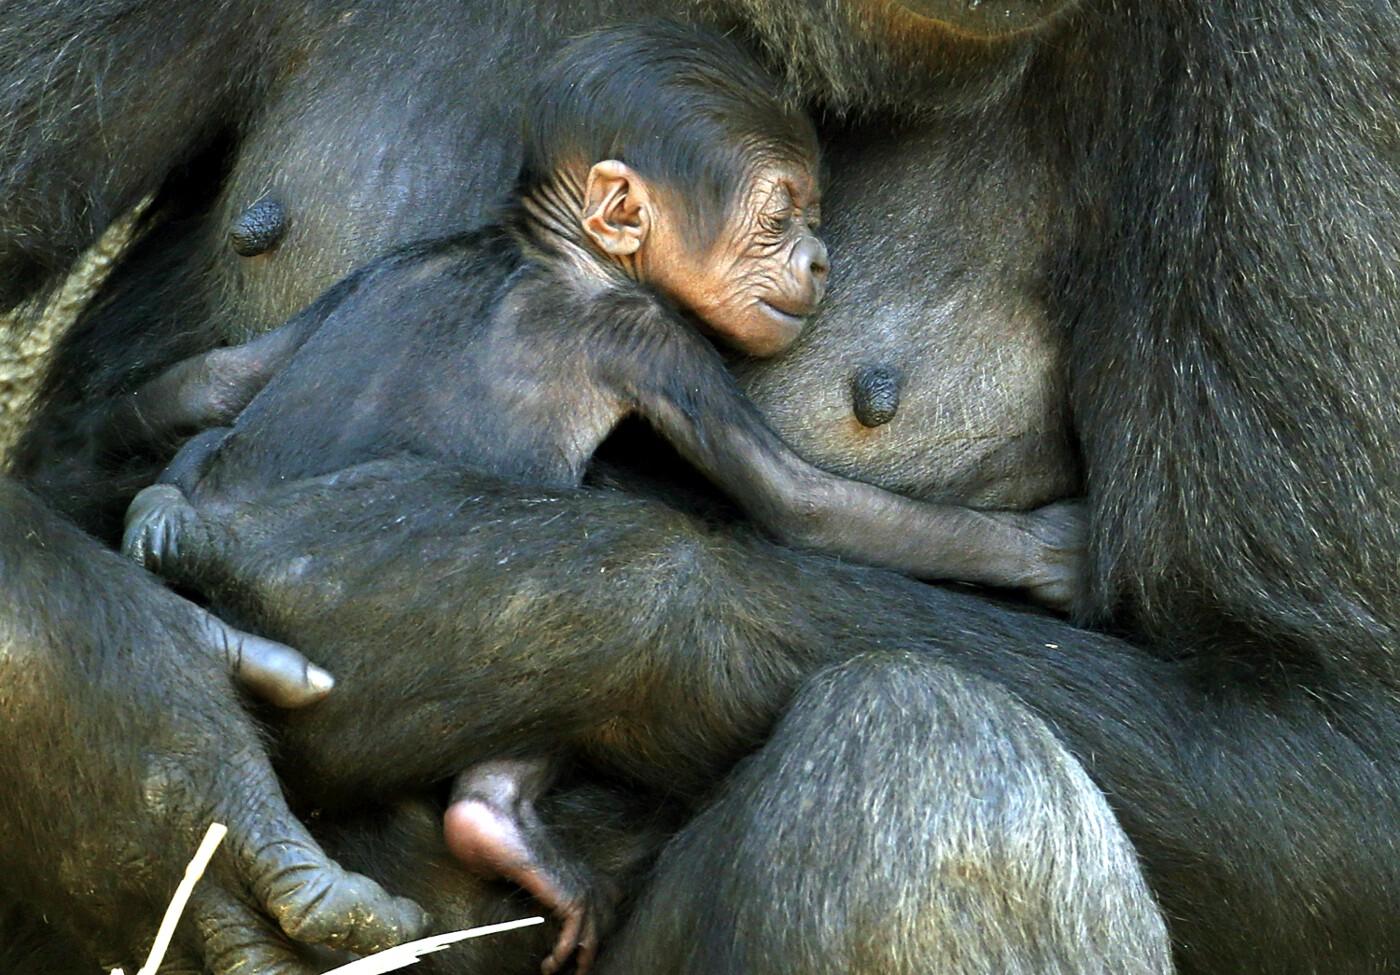 Animals of 2014 - Gorilla baby